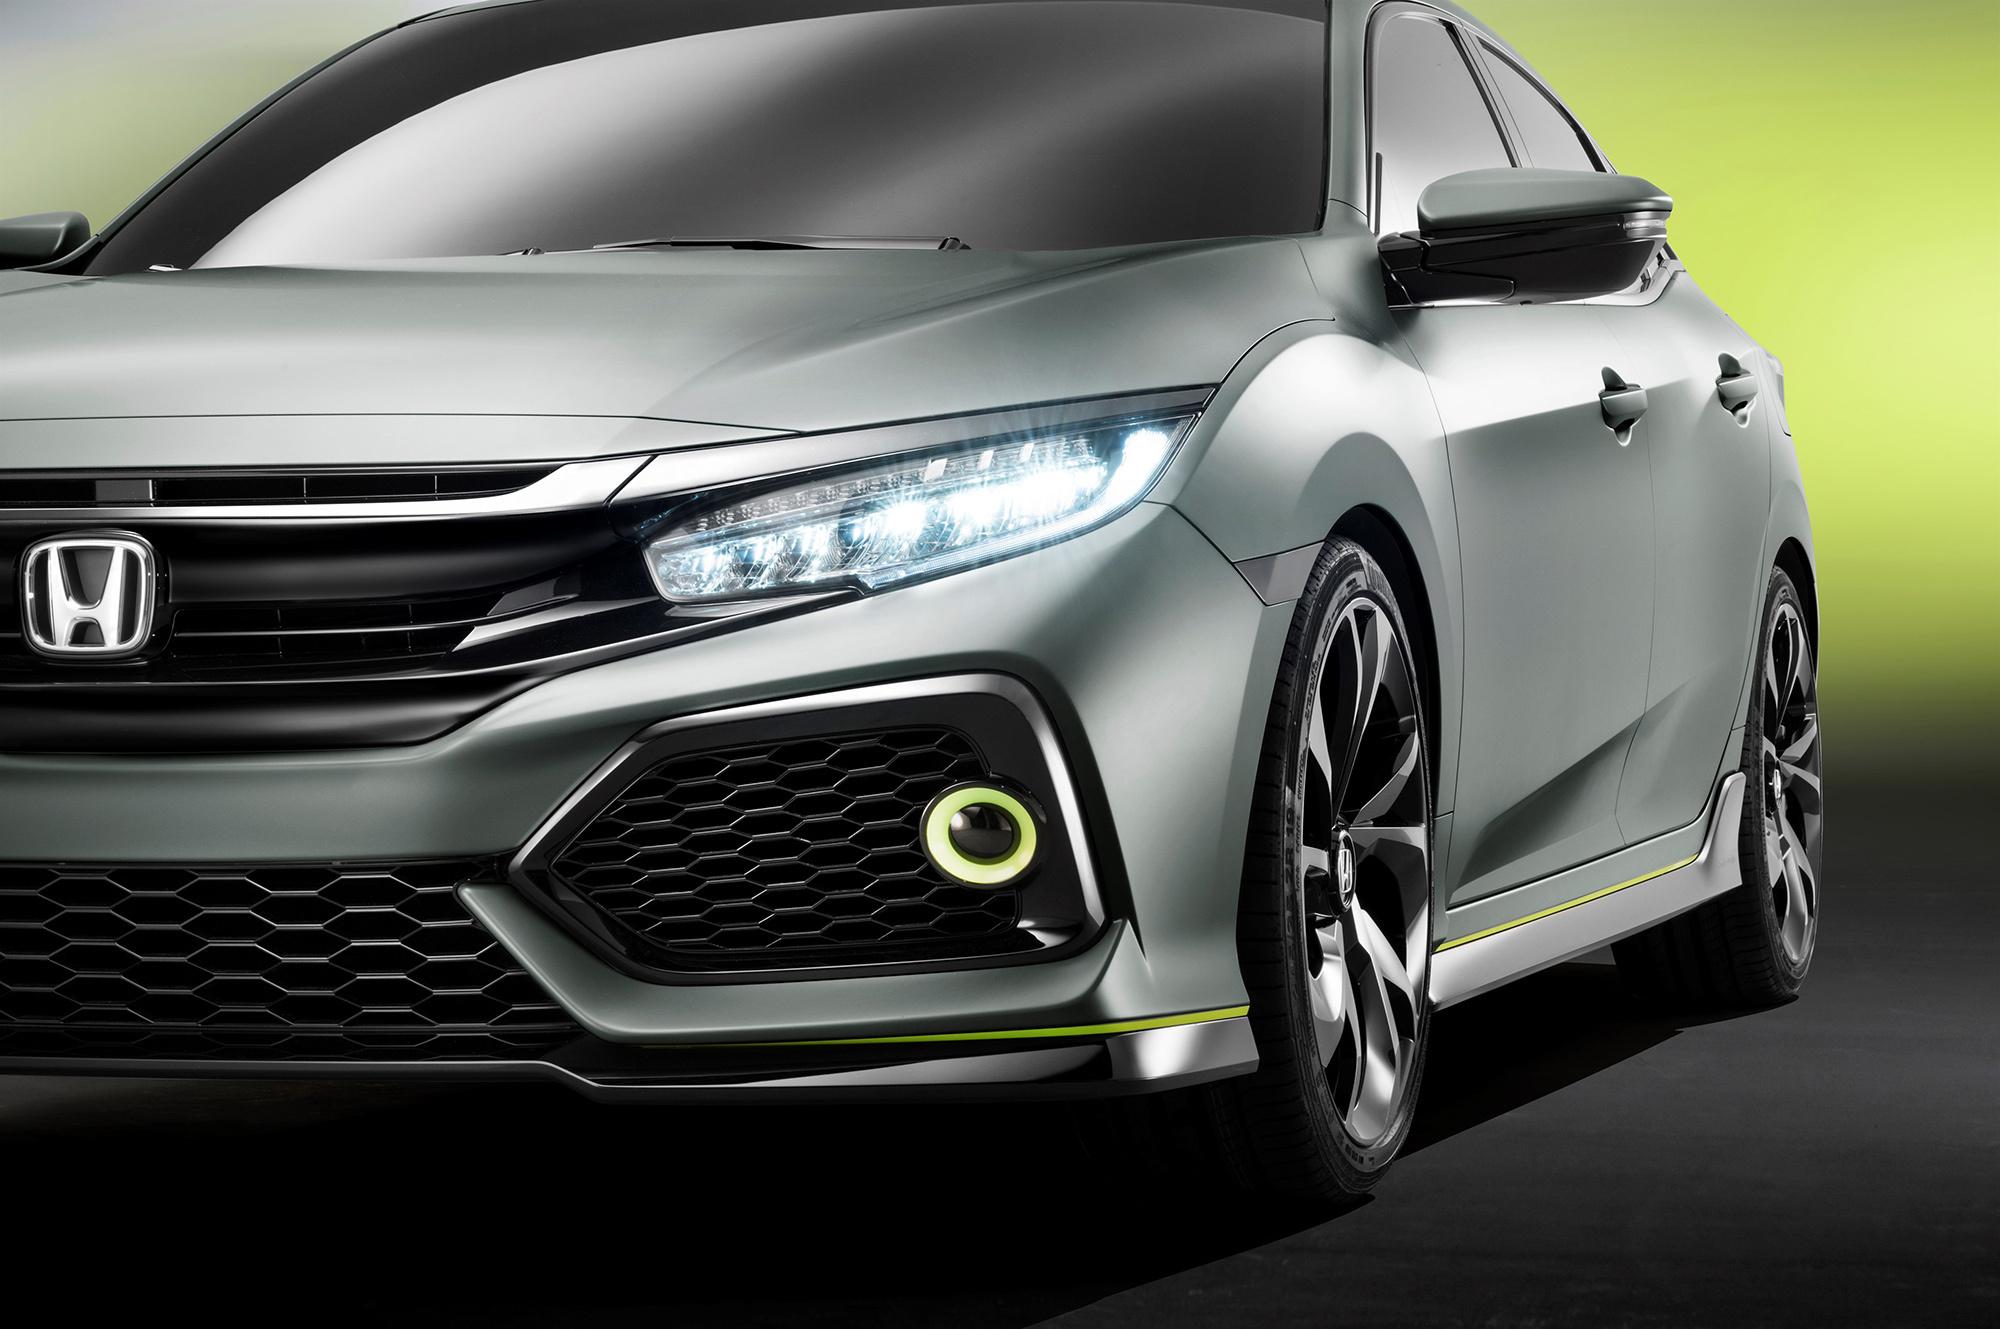 Honda Civic 2017 Widescreen